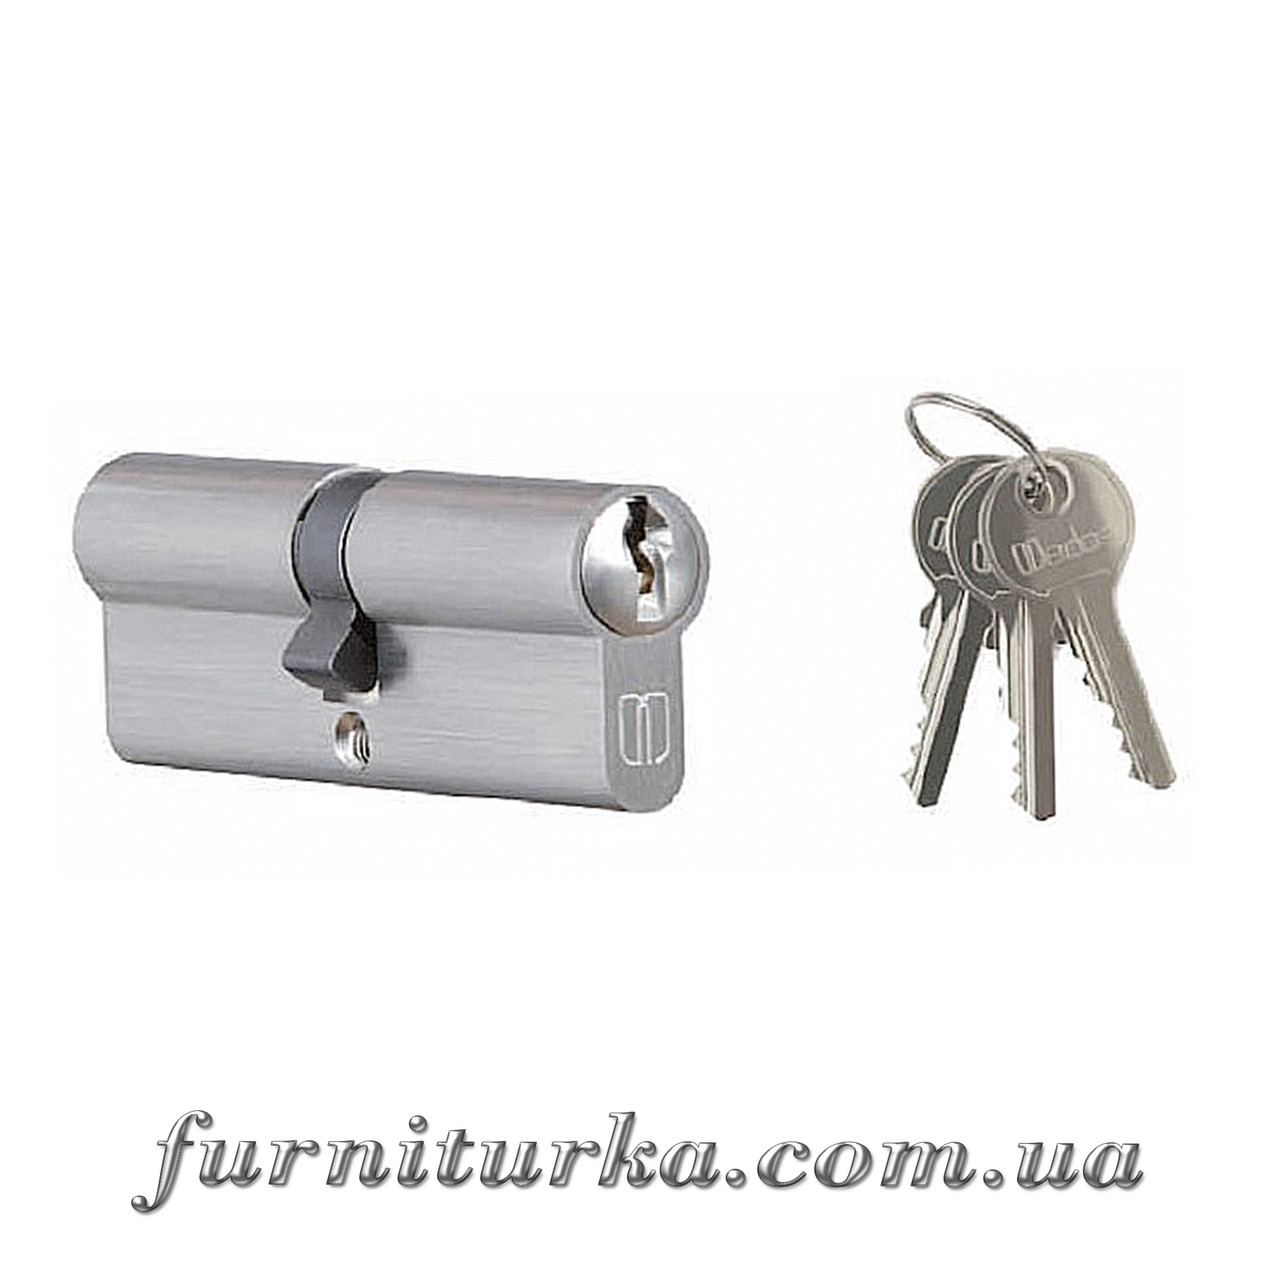 Сердцевина Medos 30/30 (ключ-ключ)